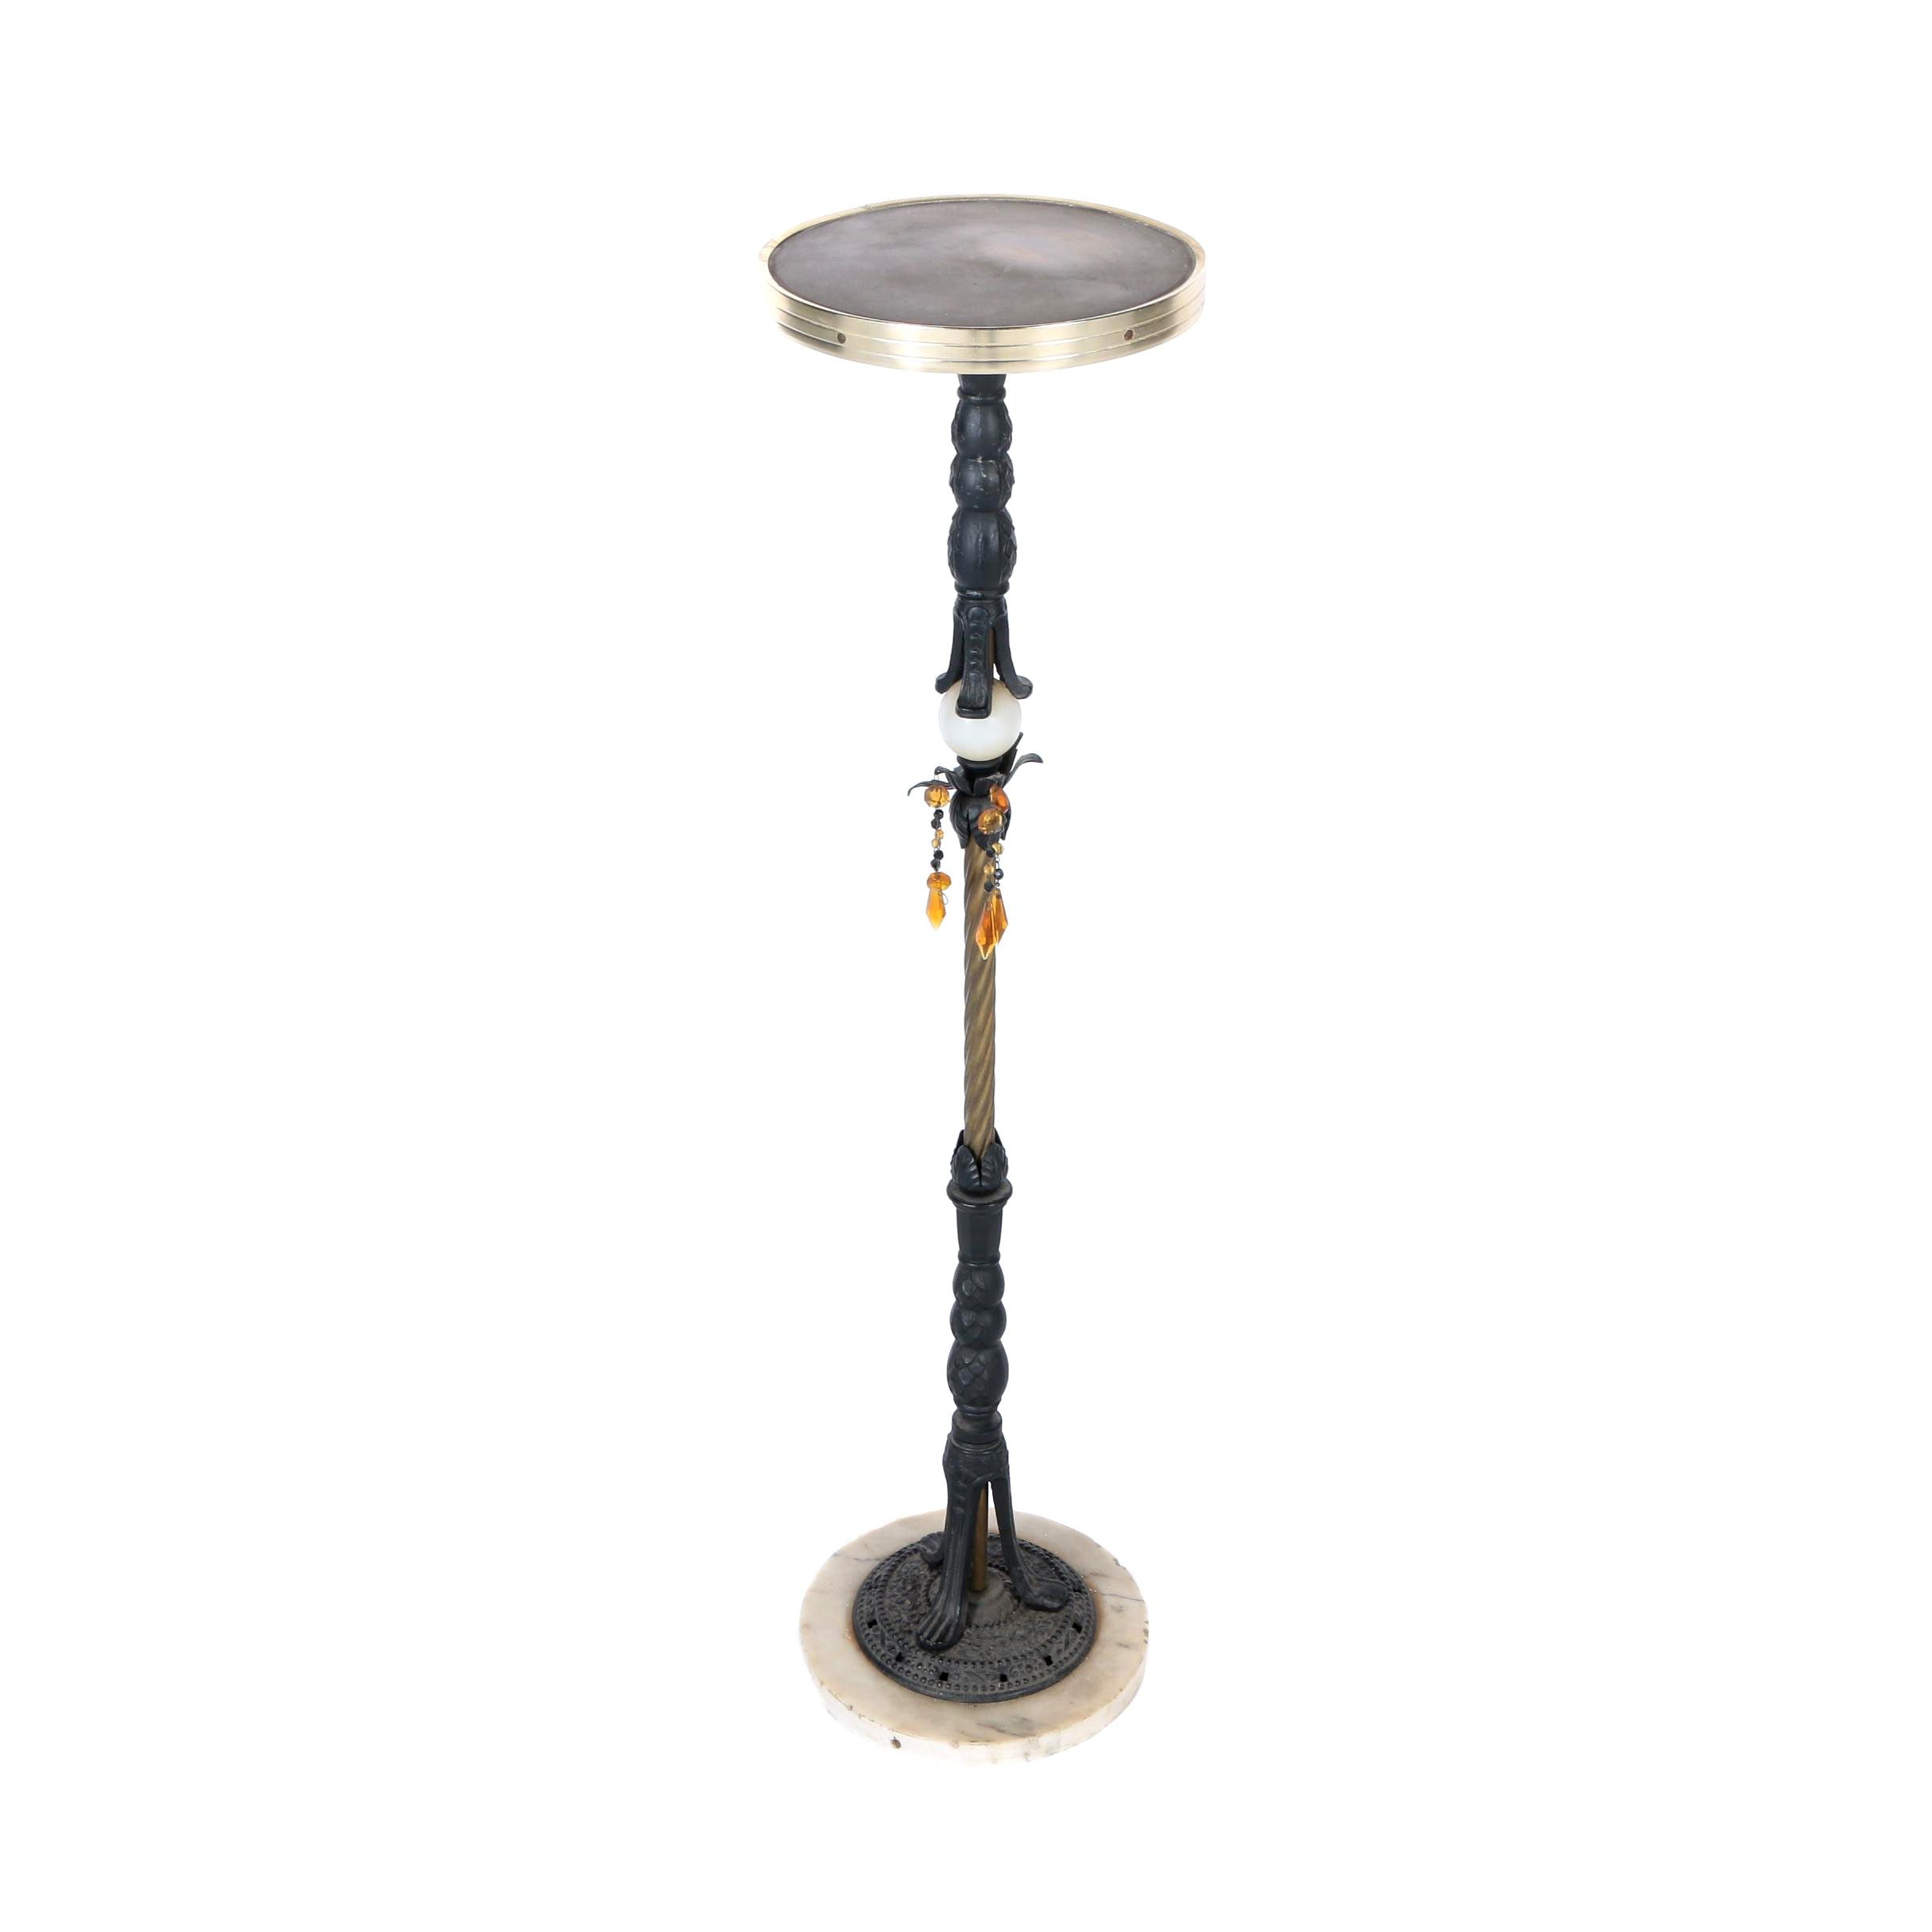 Re-Purposed Cast Iron Floor Lamp / Stand